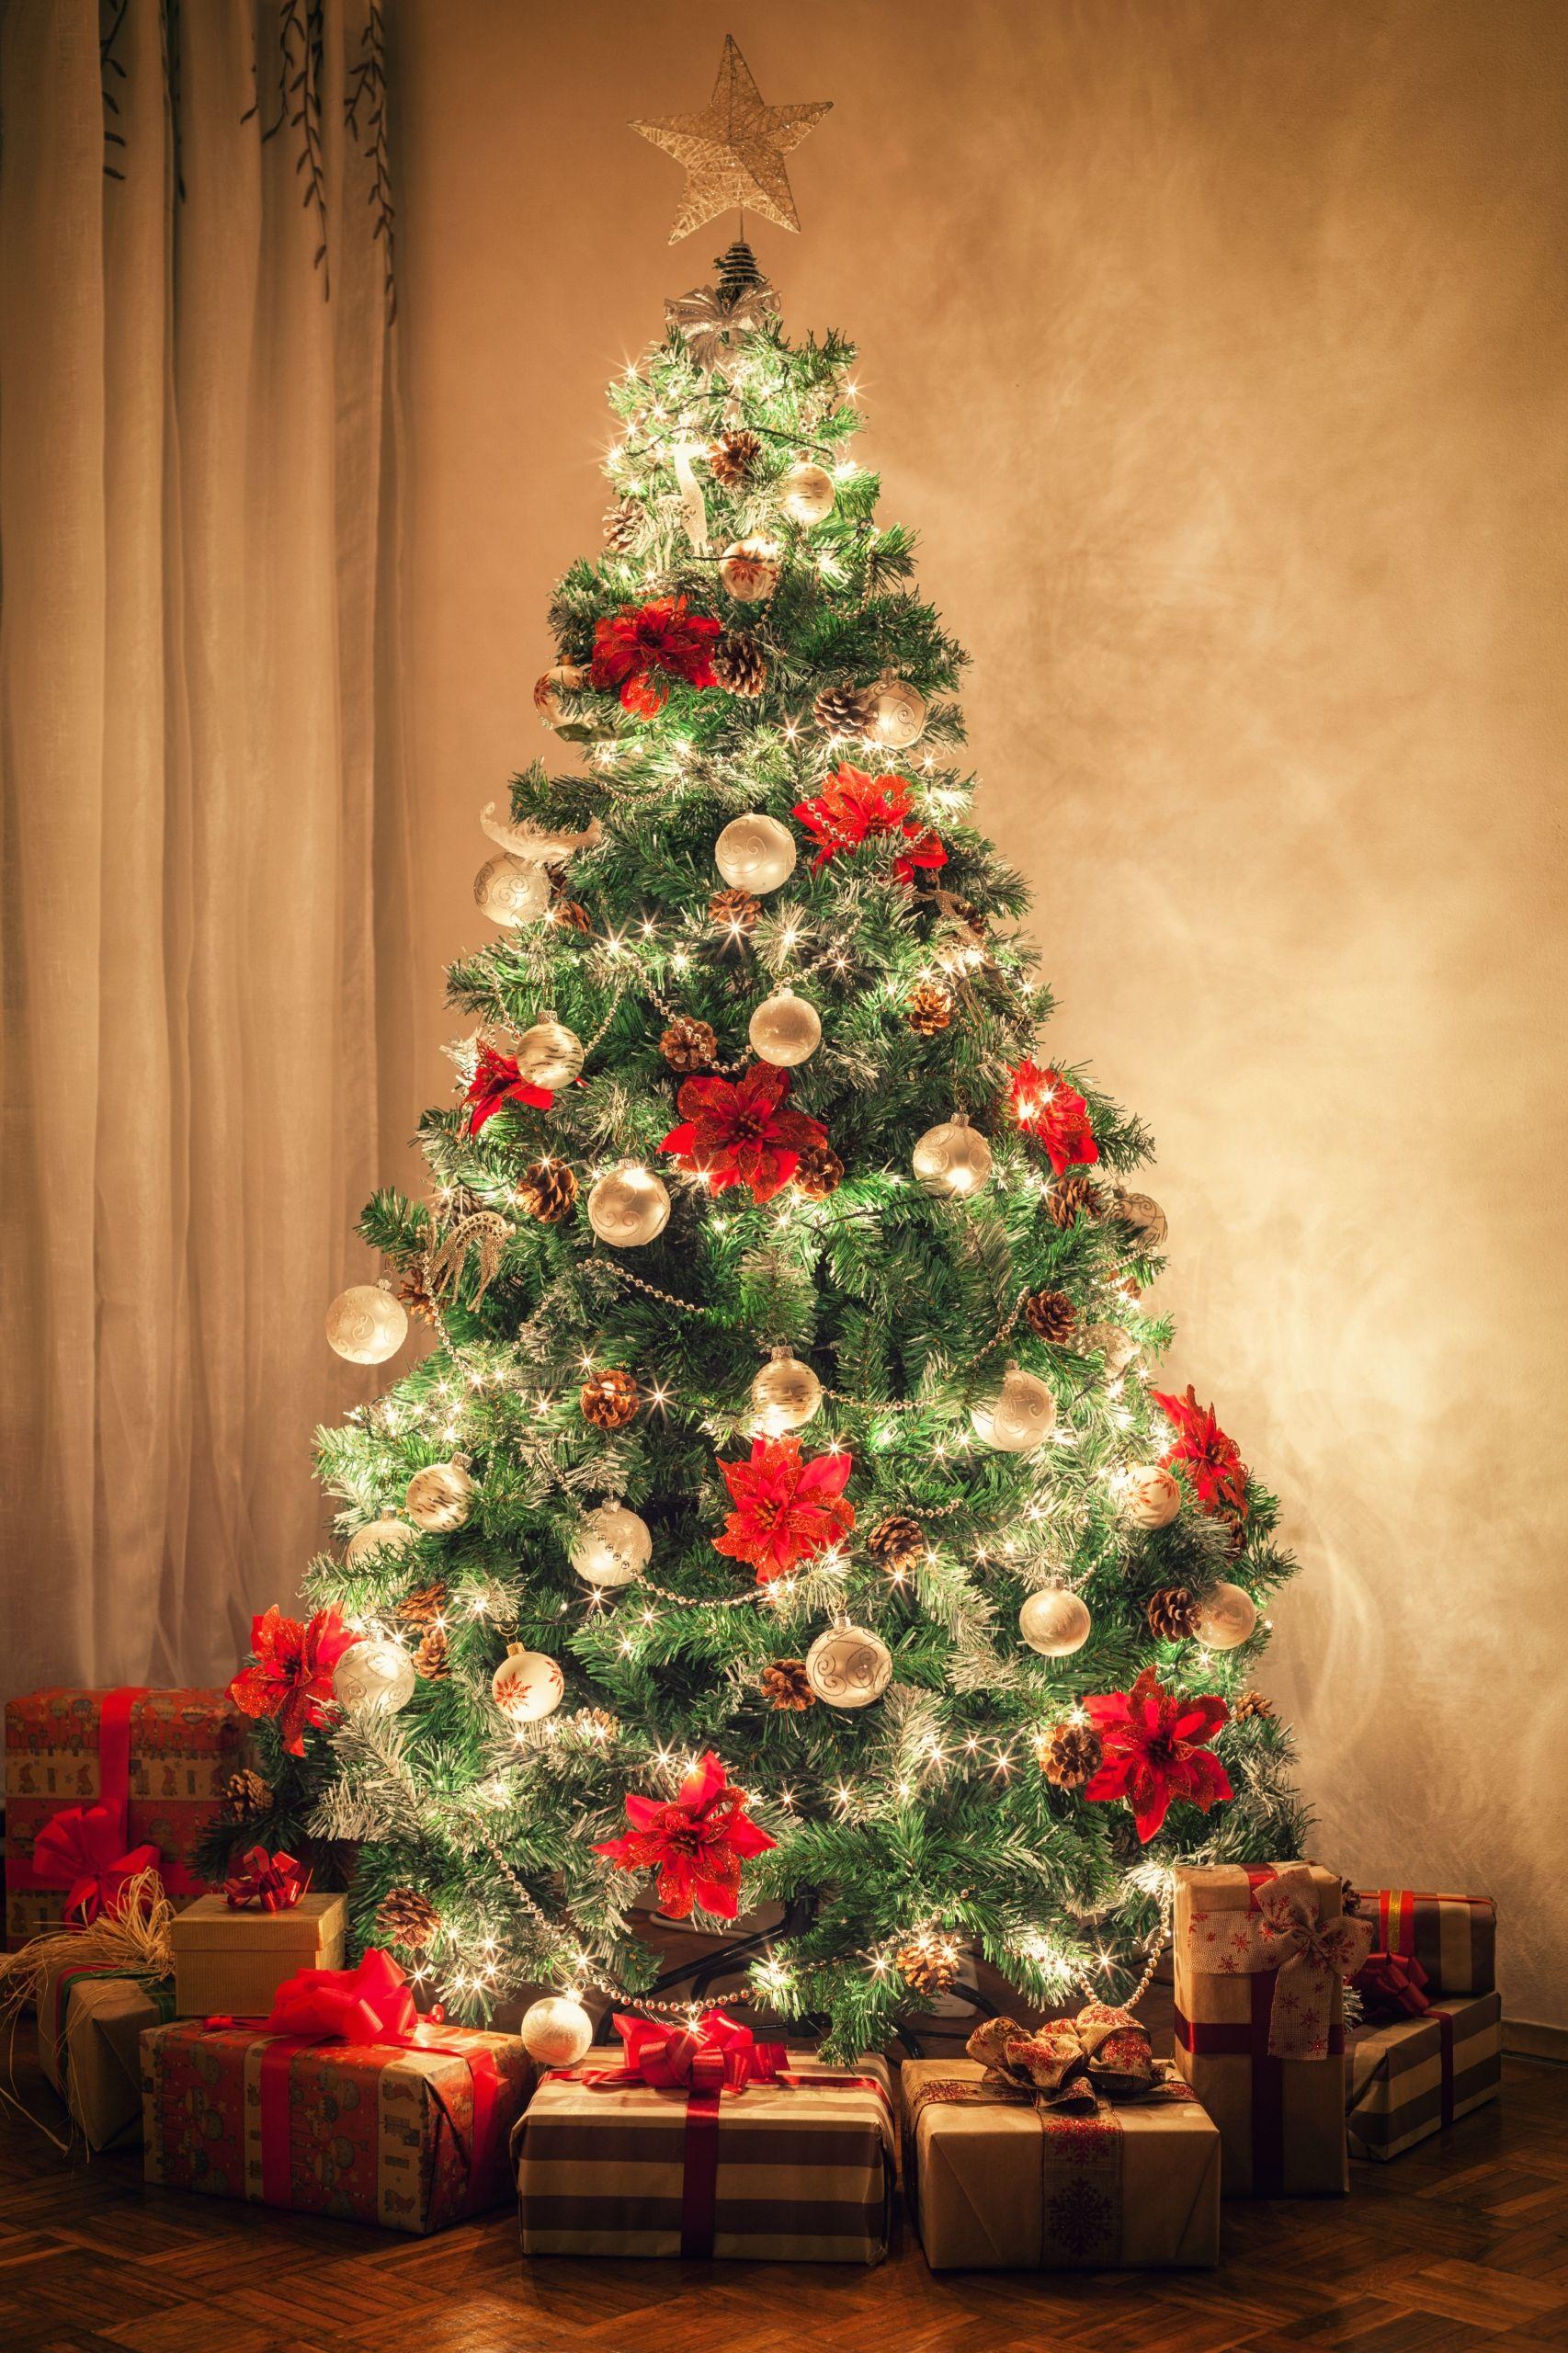 Choinka Sztuczna Sosna 220 Cm Choinki Diamentowa 7558162288 Oficjalne Archiwum Allegro Christmas Wallpaper Christmas Tree With Presents Christmas Tree